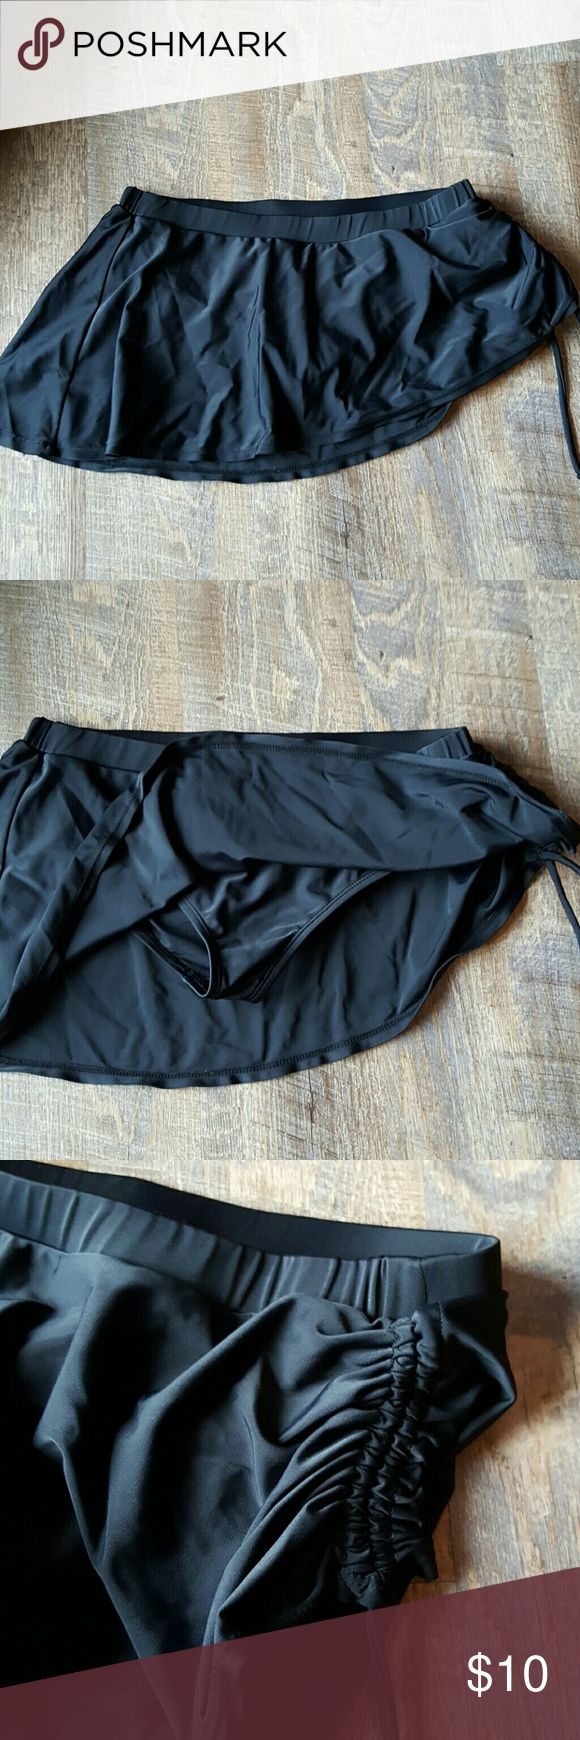 Torrid skirted swim bikini bottoms size 0 Like new skirted bikini bottoms.  Sexy side ruffling.  Very flattering on.  Barely worn.   Bundle discount available. Nonsmoking home. All reasonable offers accepted. torrid Swim Bikinis